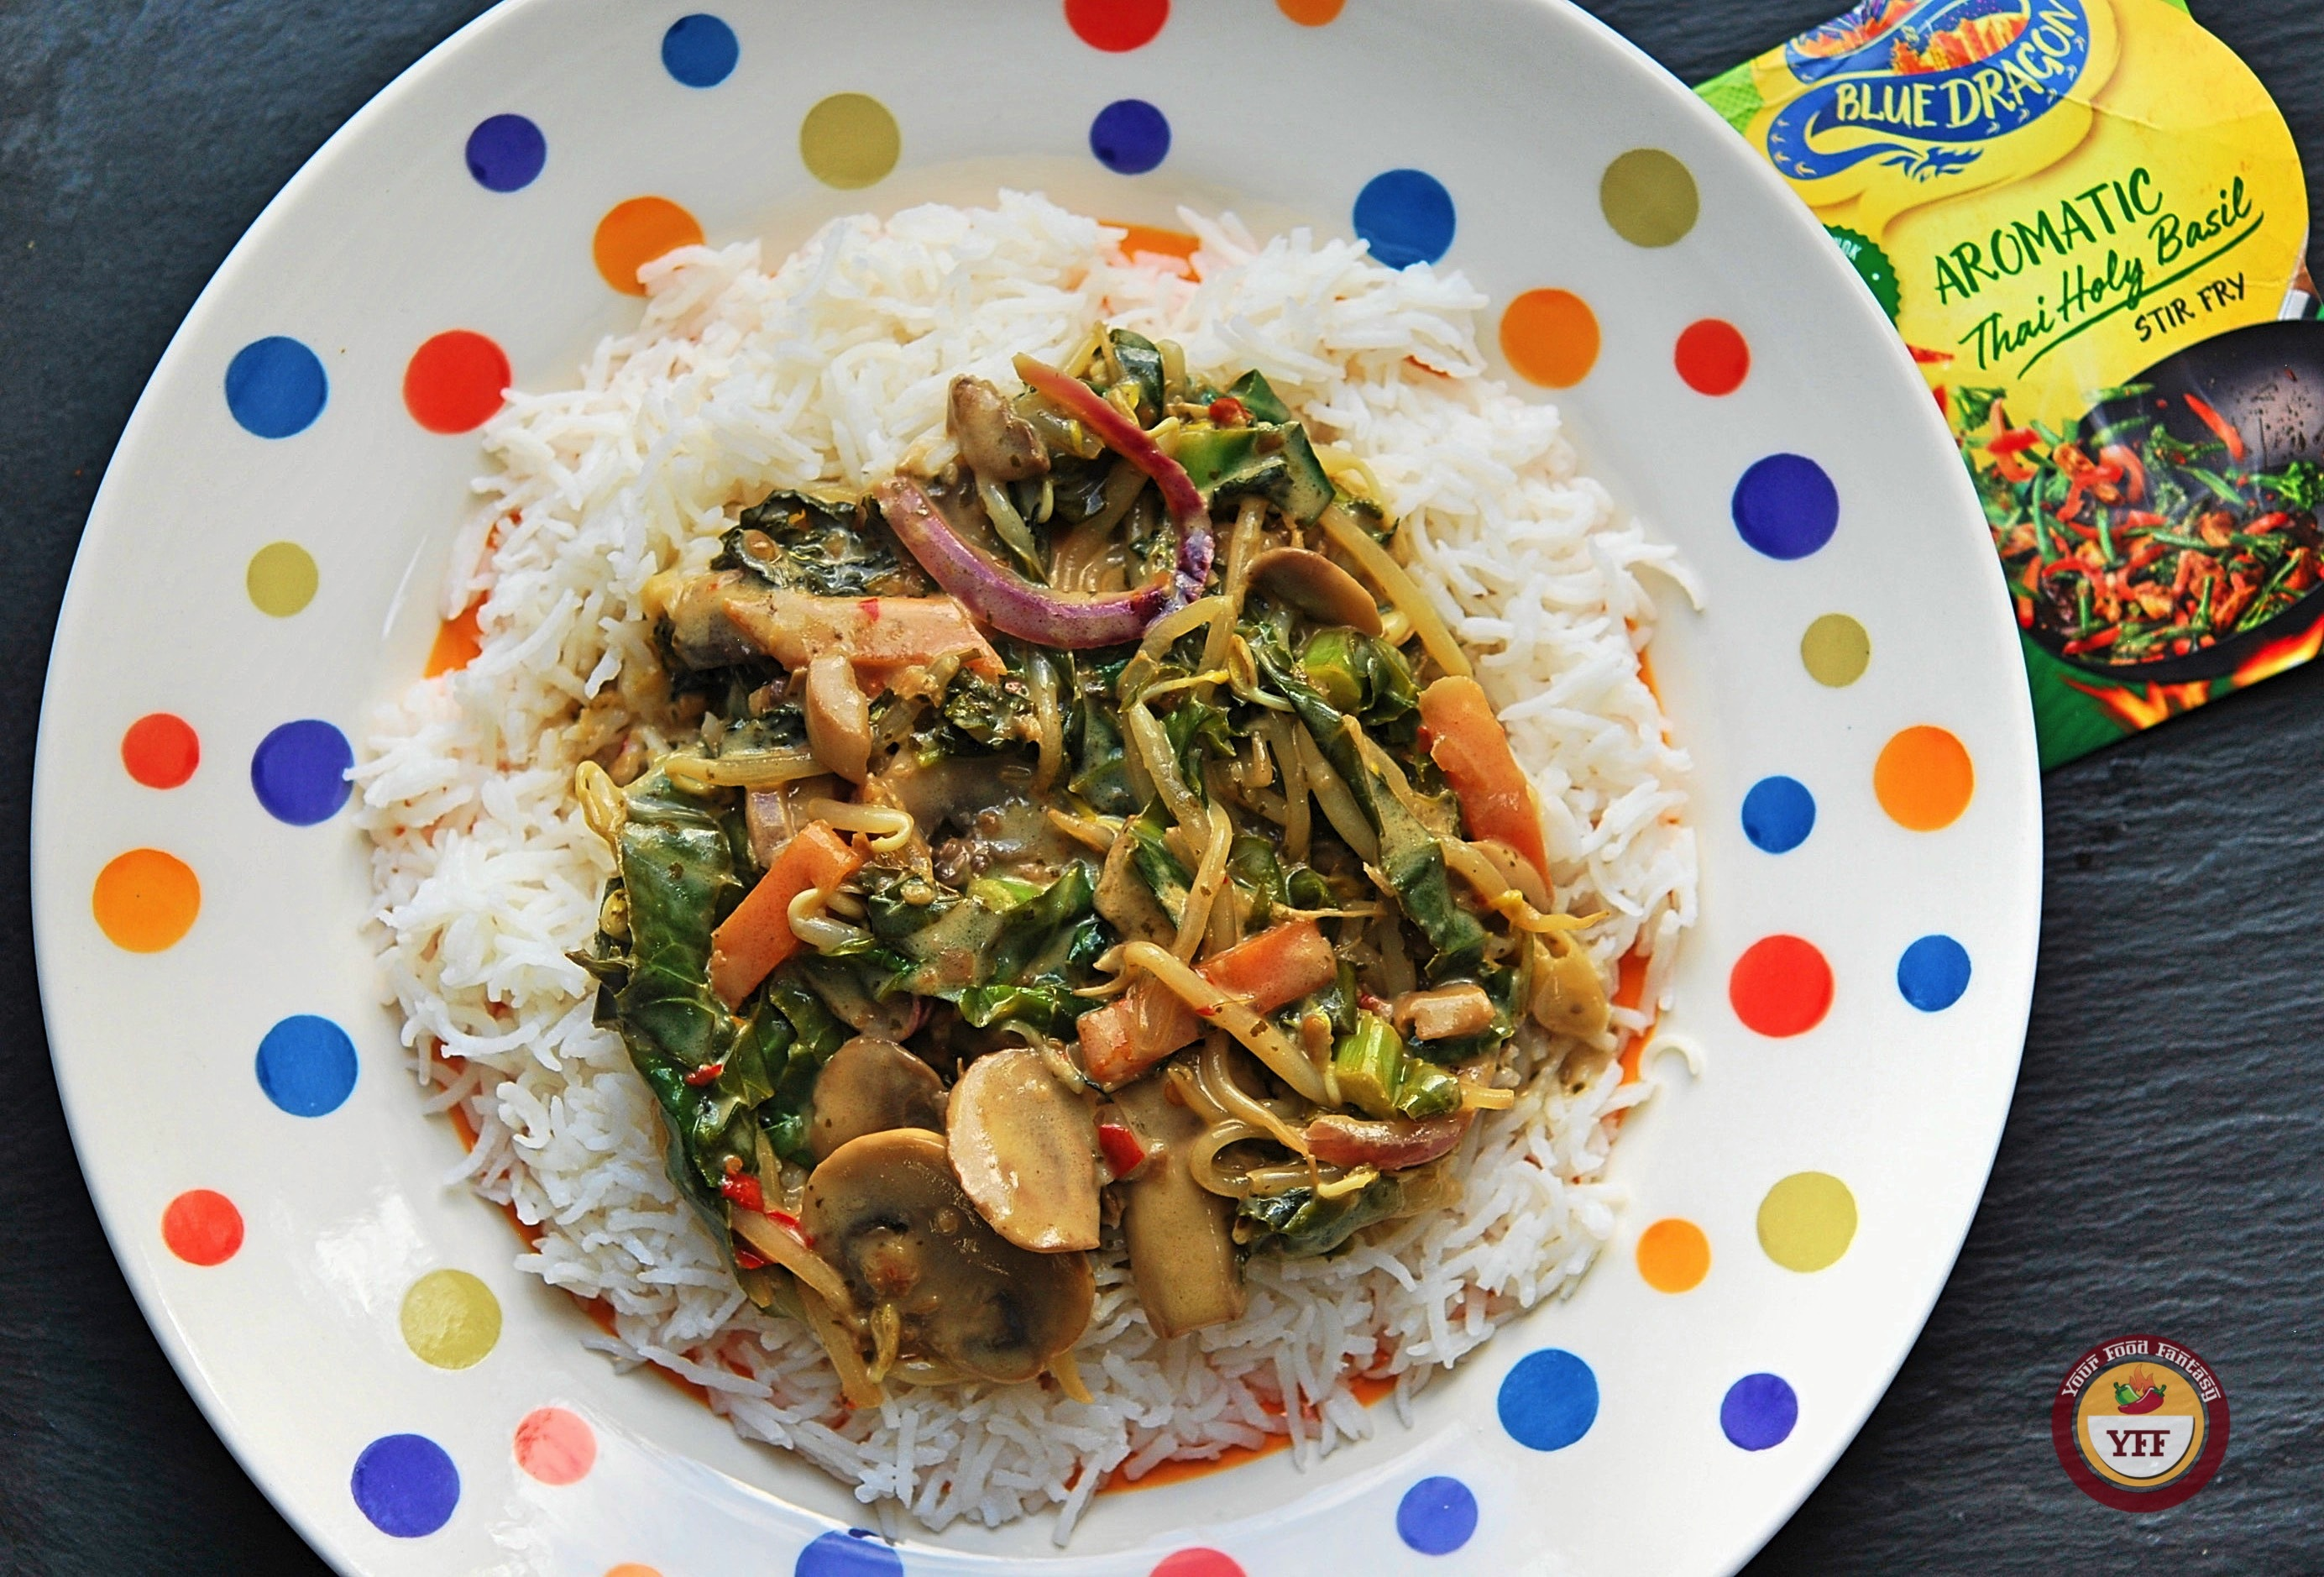 Blue Dragon Thai Basil Kit Review | Your Food Fantasy